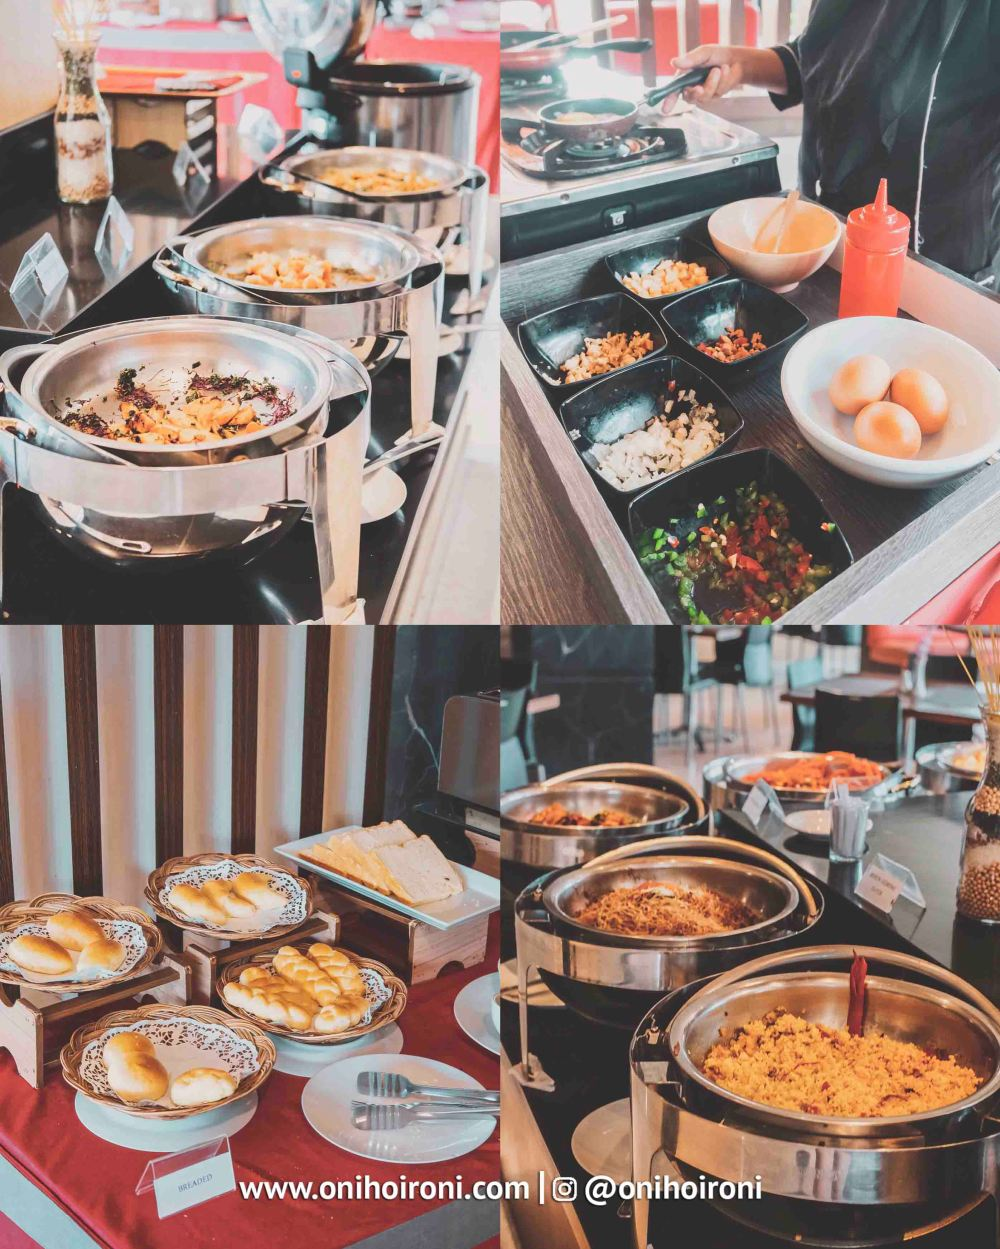 1 Breakfast M One Hotel Sentul Bogor, Onihoironi